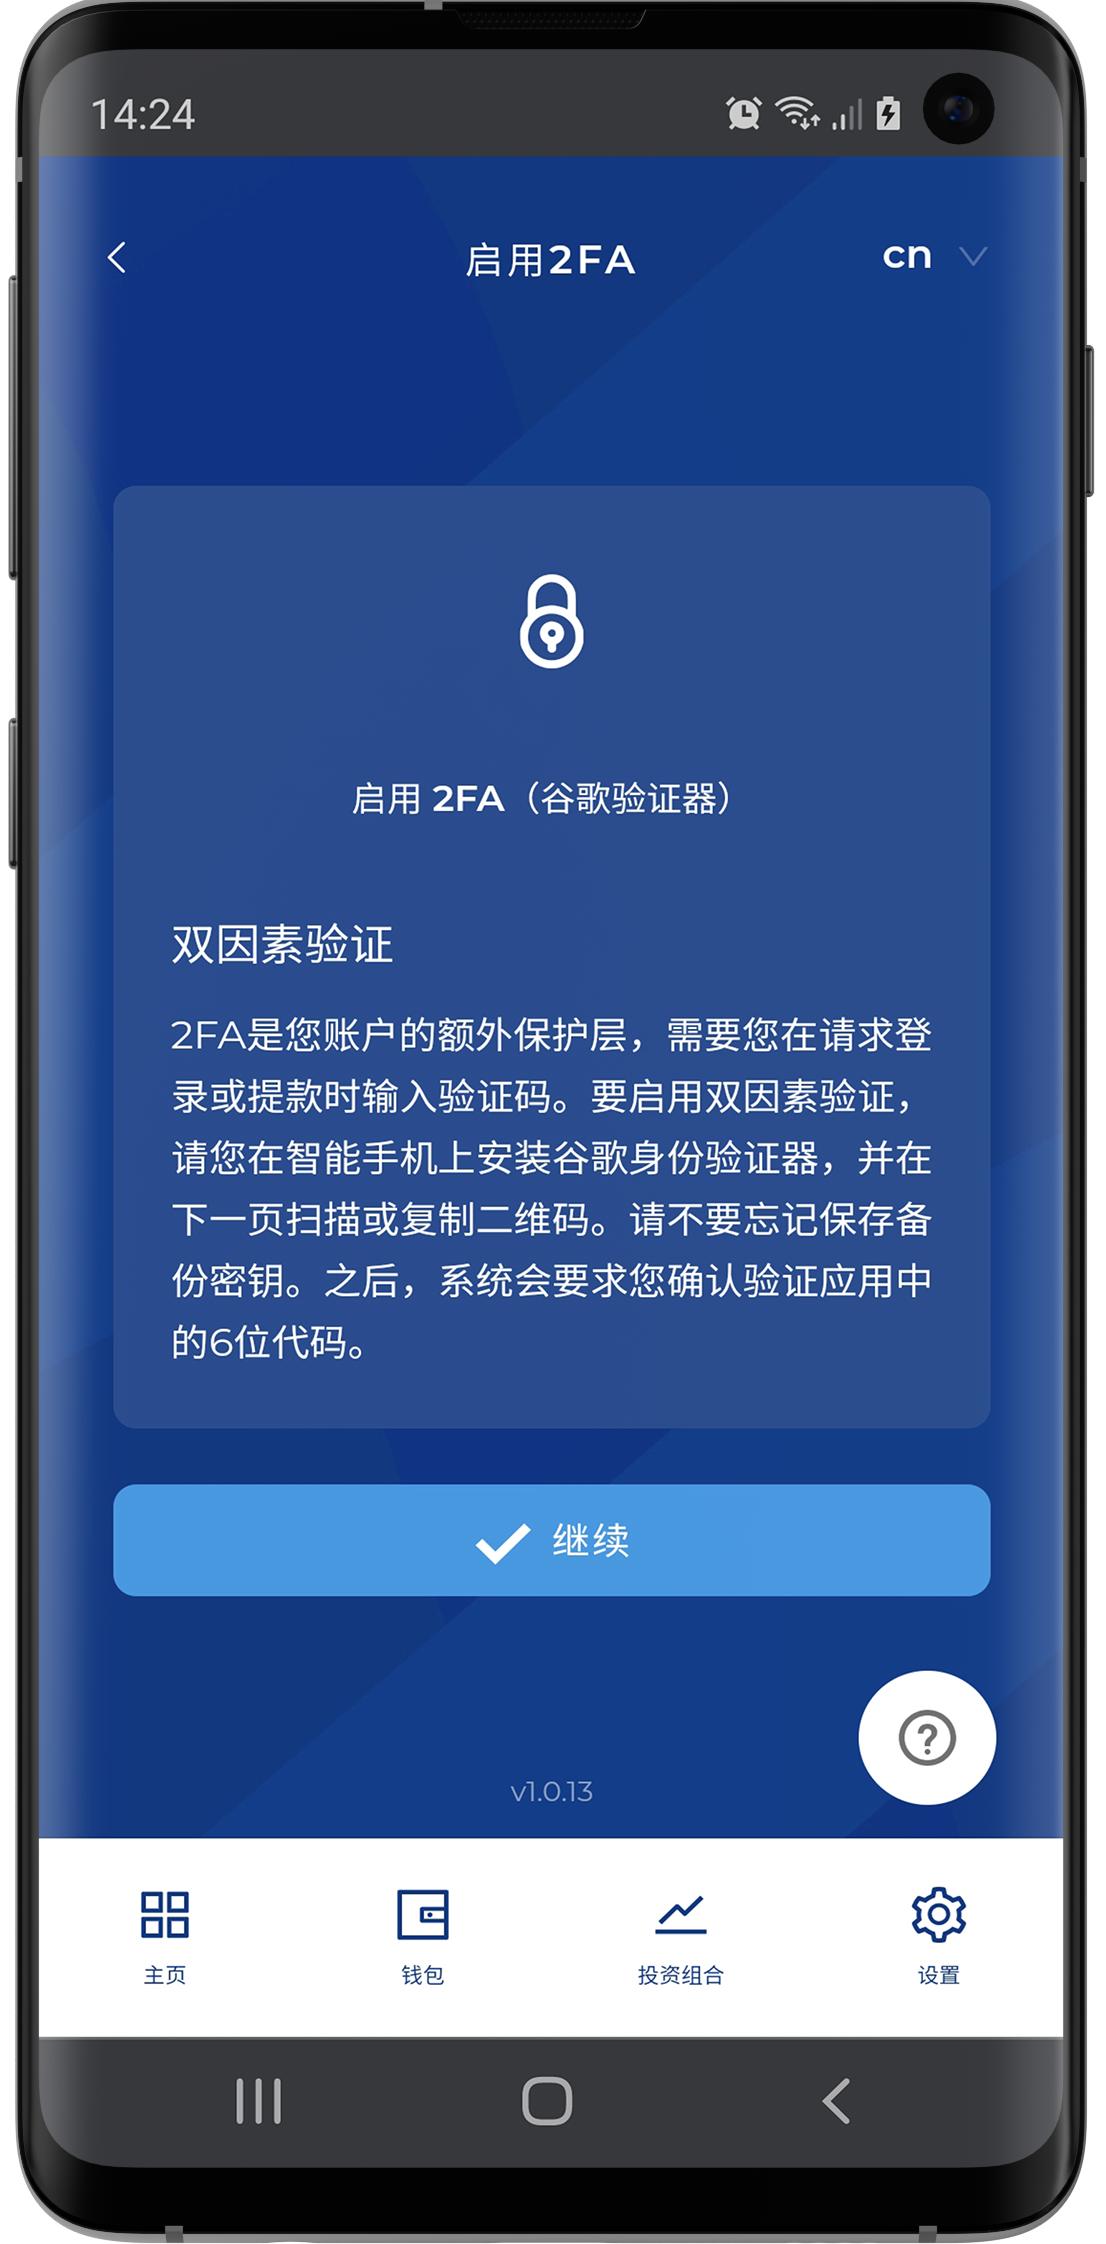 CN_2FA.png